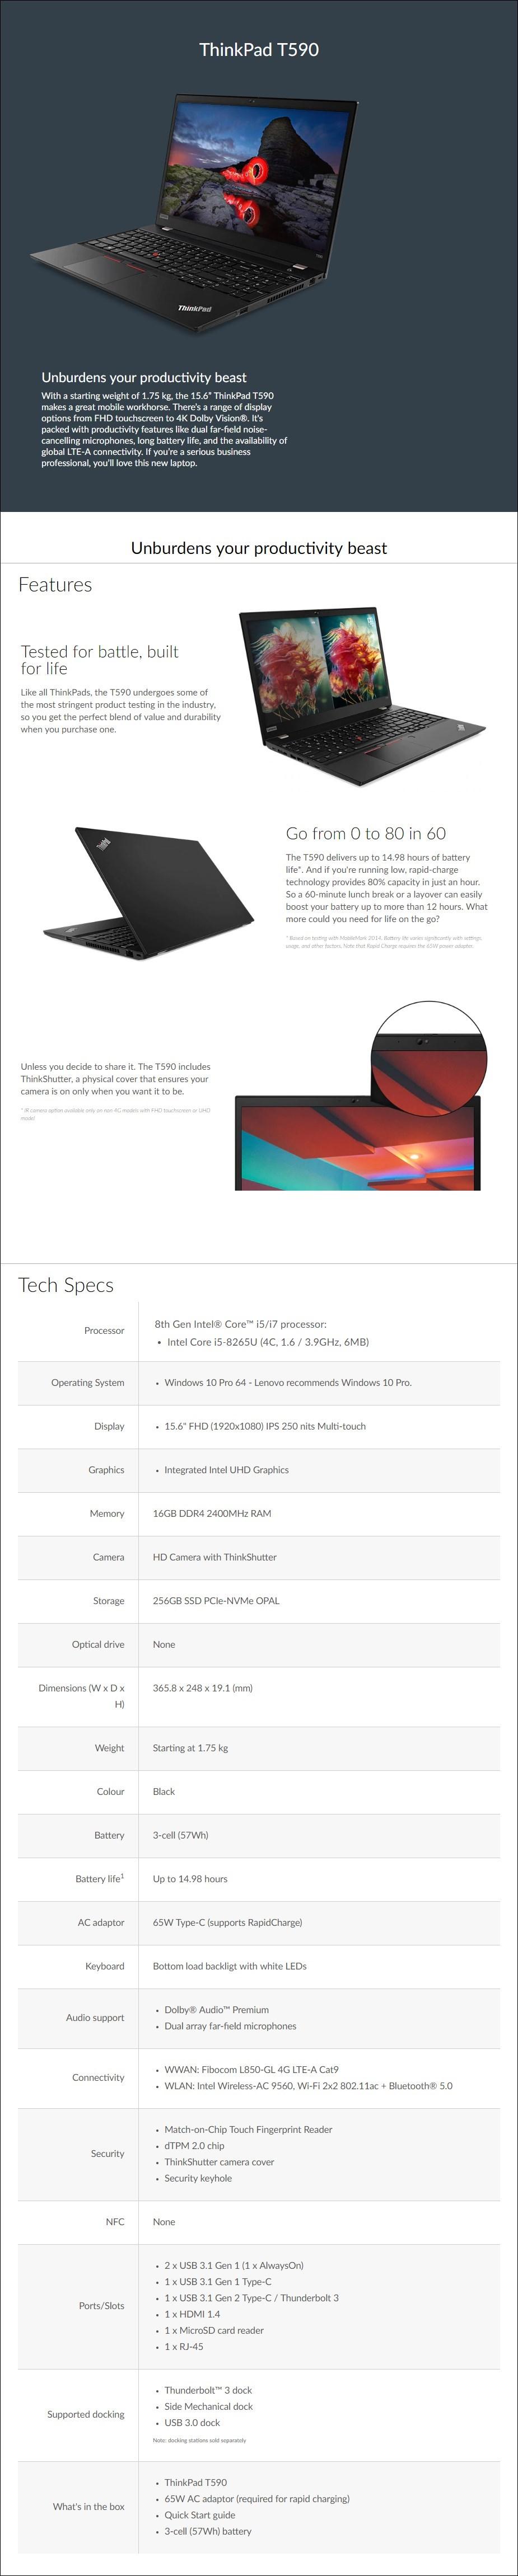 lenovo-thinkpad-t590-156-alaptop-i58265u-16gb-256gb-ssd-w10p-4g-touch-ac26771-3.jpg